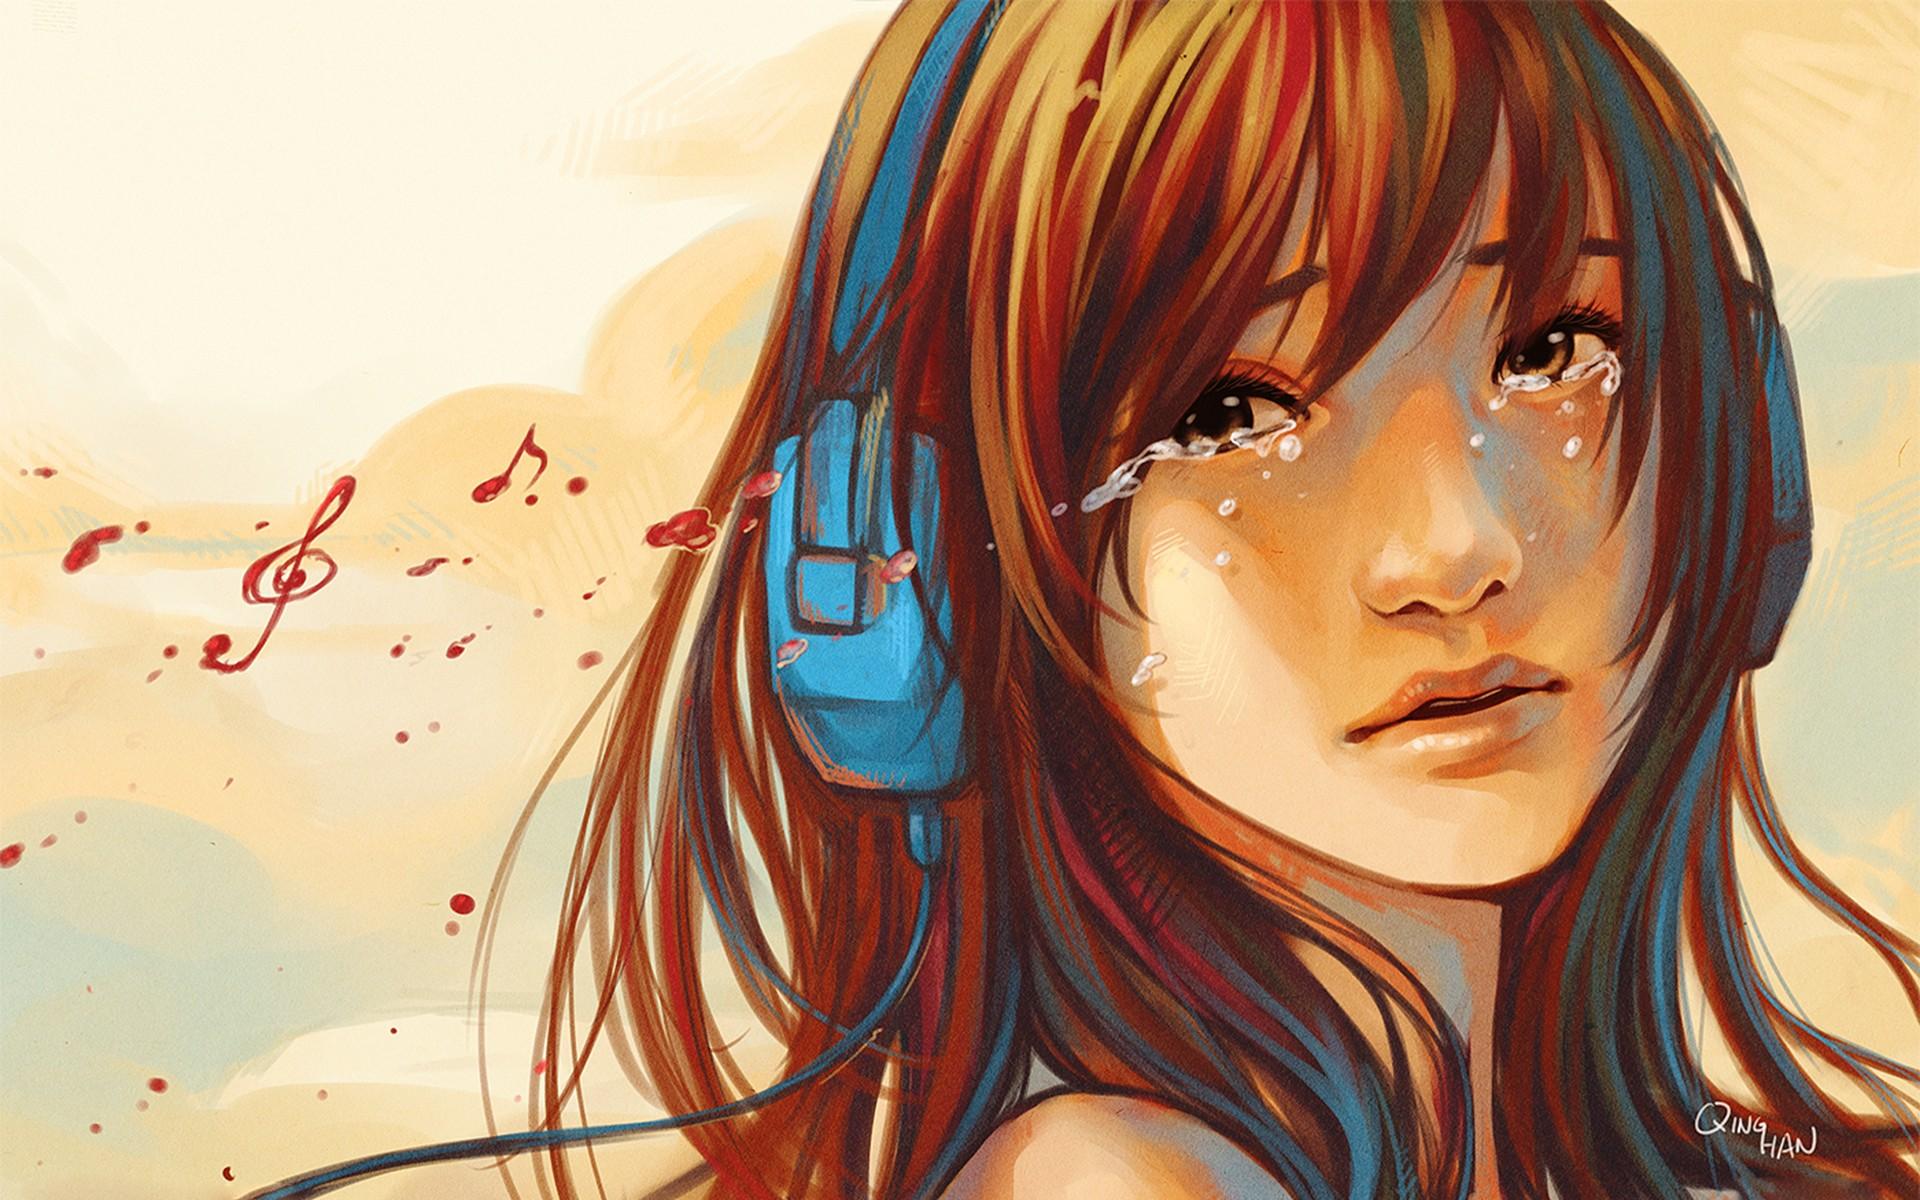 Headphones face drawing cry sad mood wallpaper 1920x1200 - Portrait anime wallpaper ...